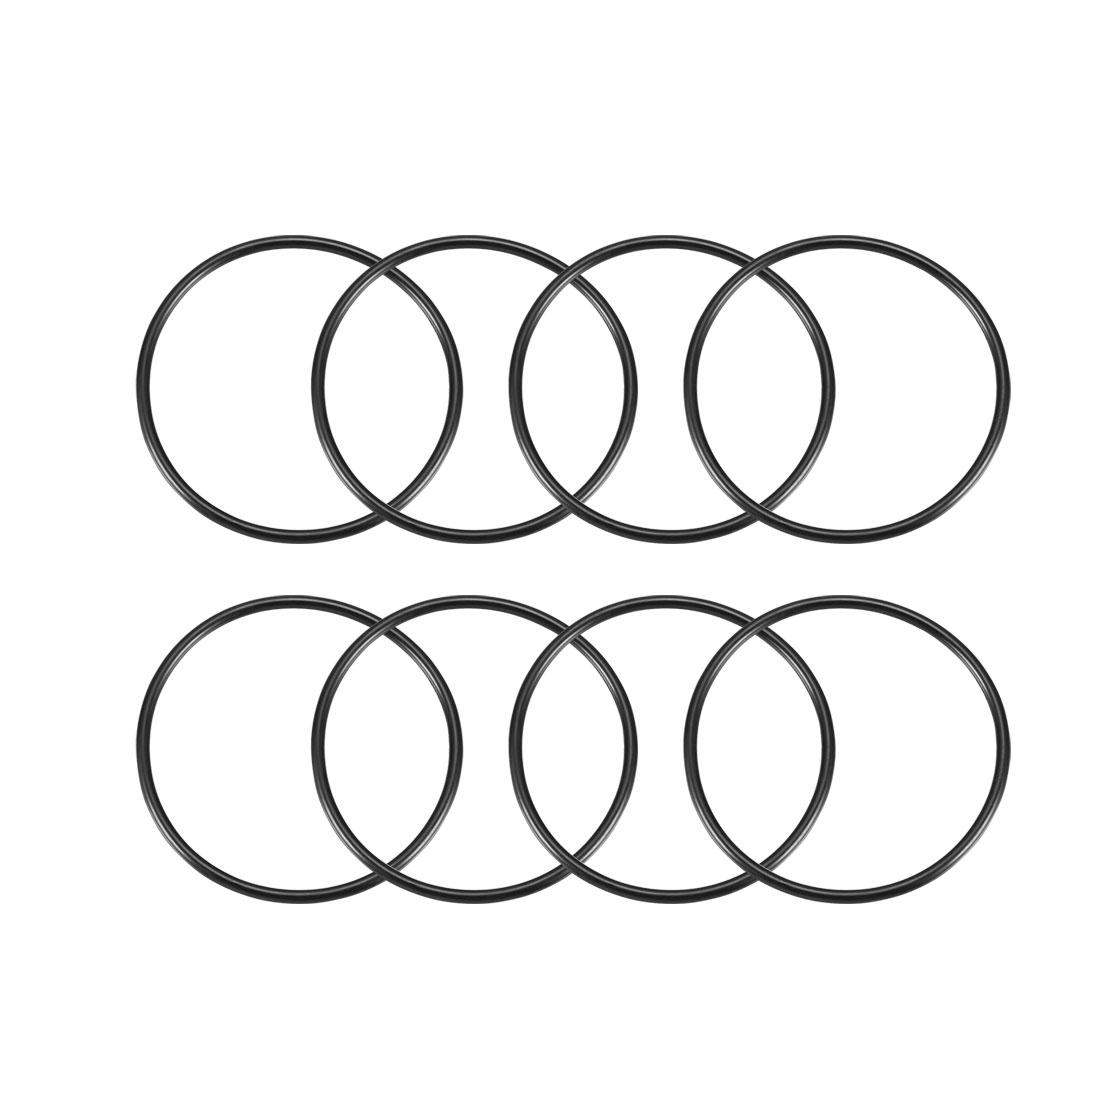 8 Pcs 70mm Diameter x 3mm Height O Type Sealing Ring Black Rubber